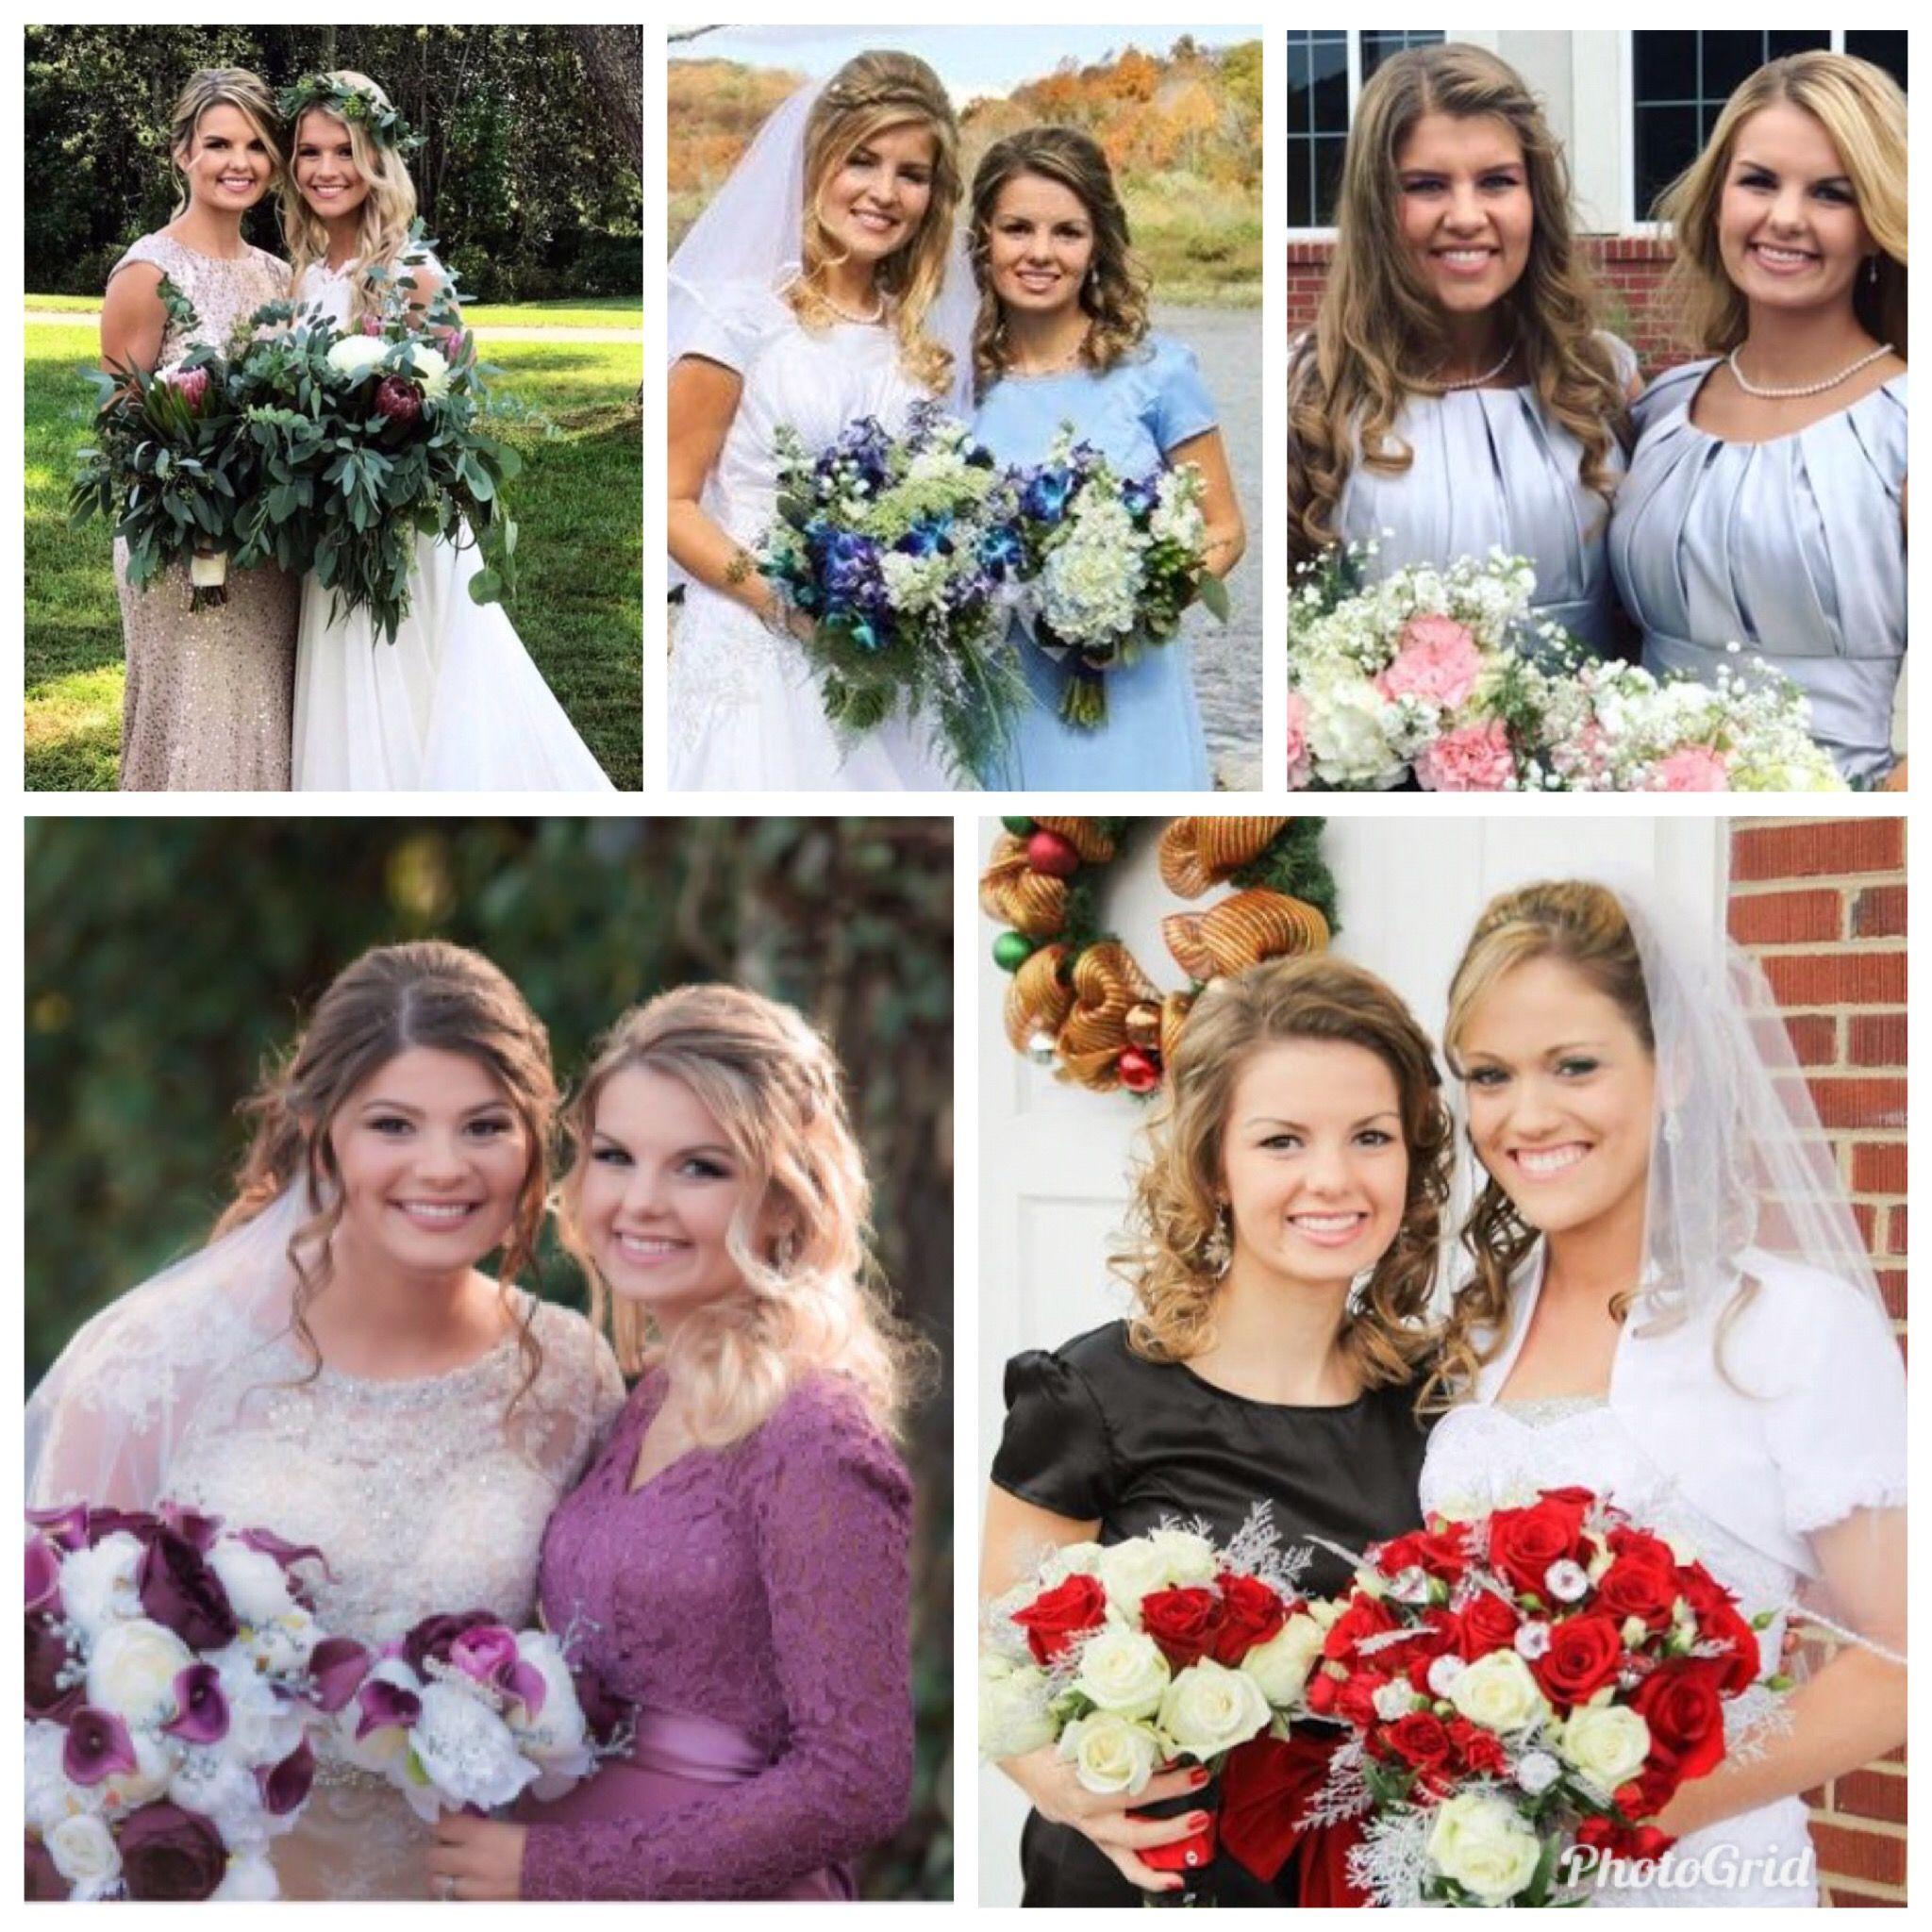 Alyssa has been an attendant in every bates wedding so far